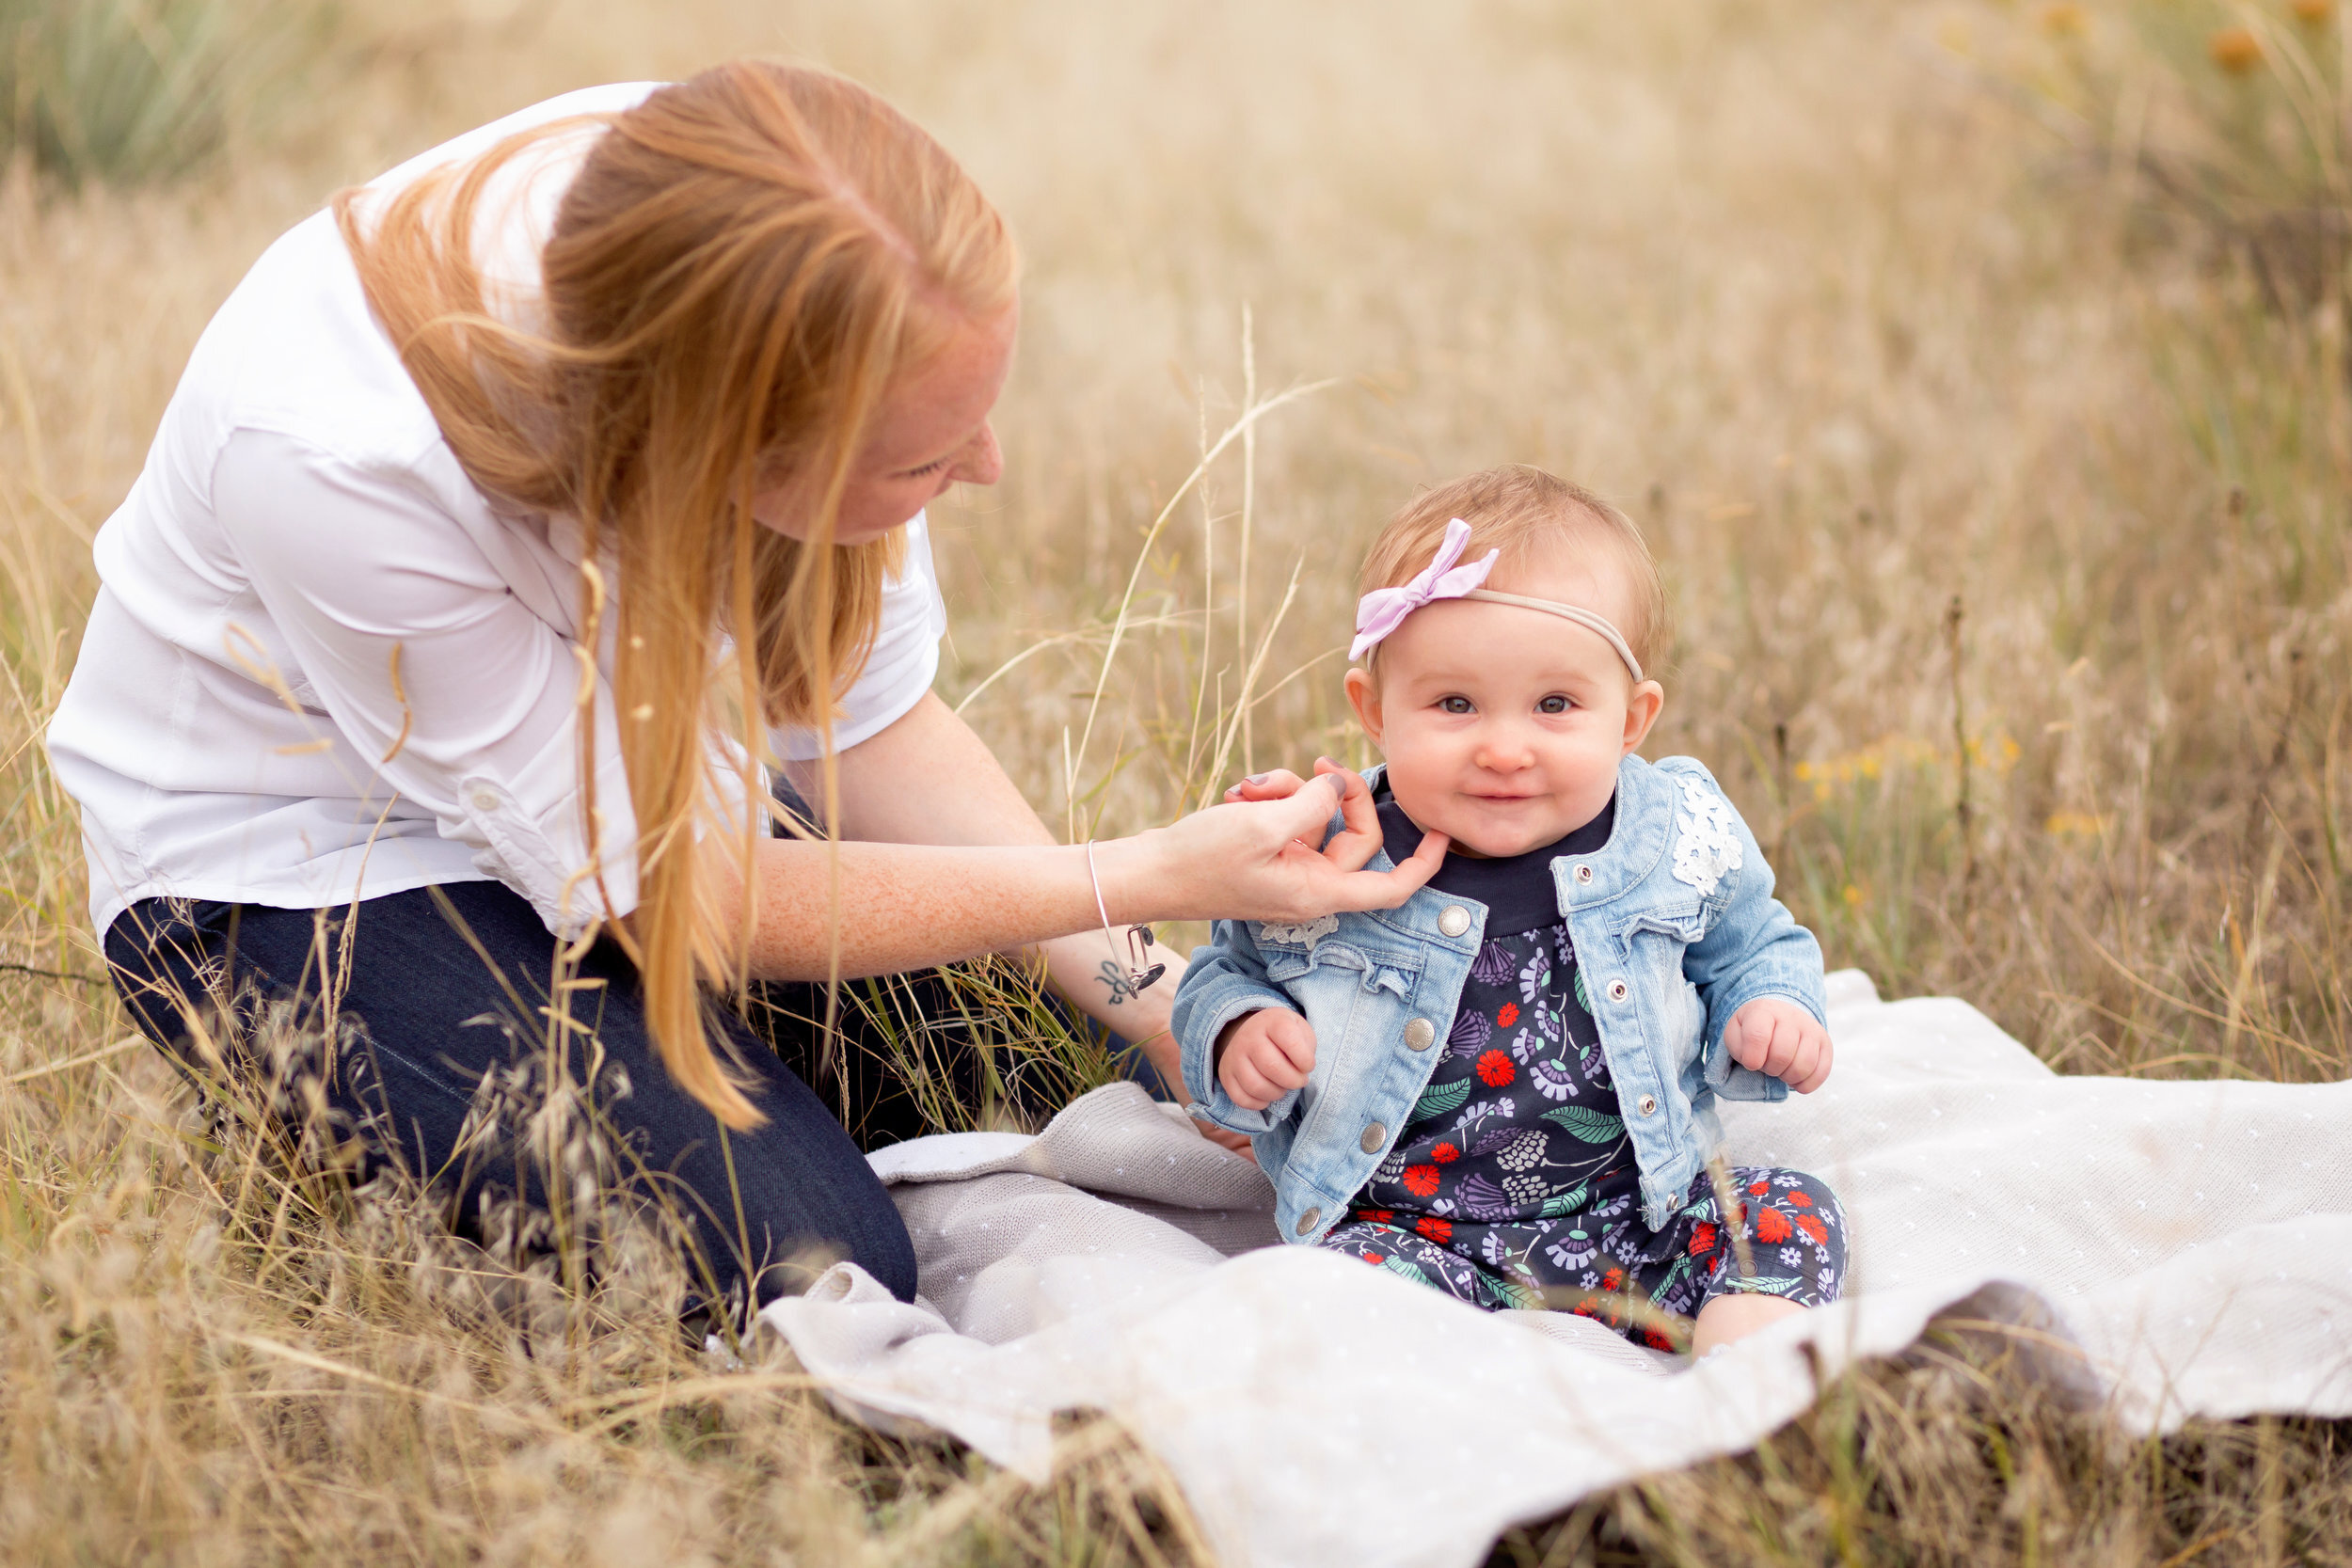 Denver+Newborn+Photographer,+Denver+Maternity+Photographer.jpeg